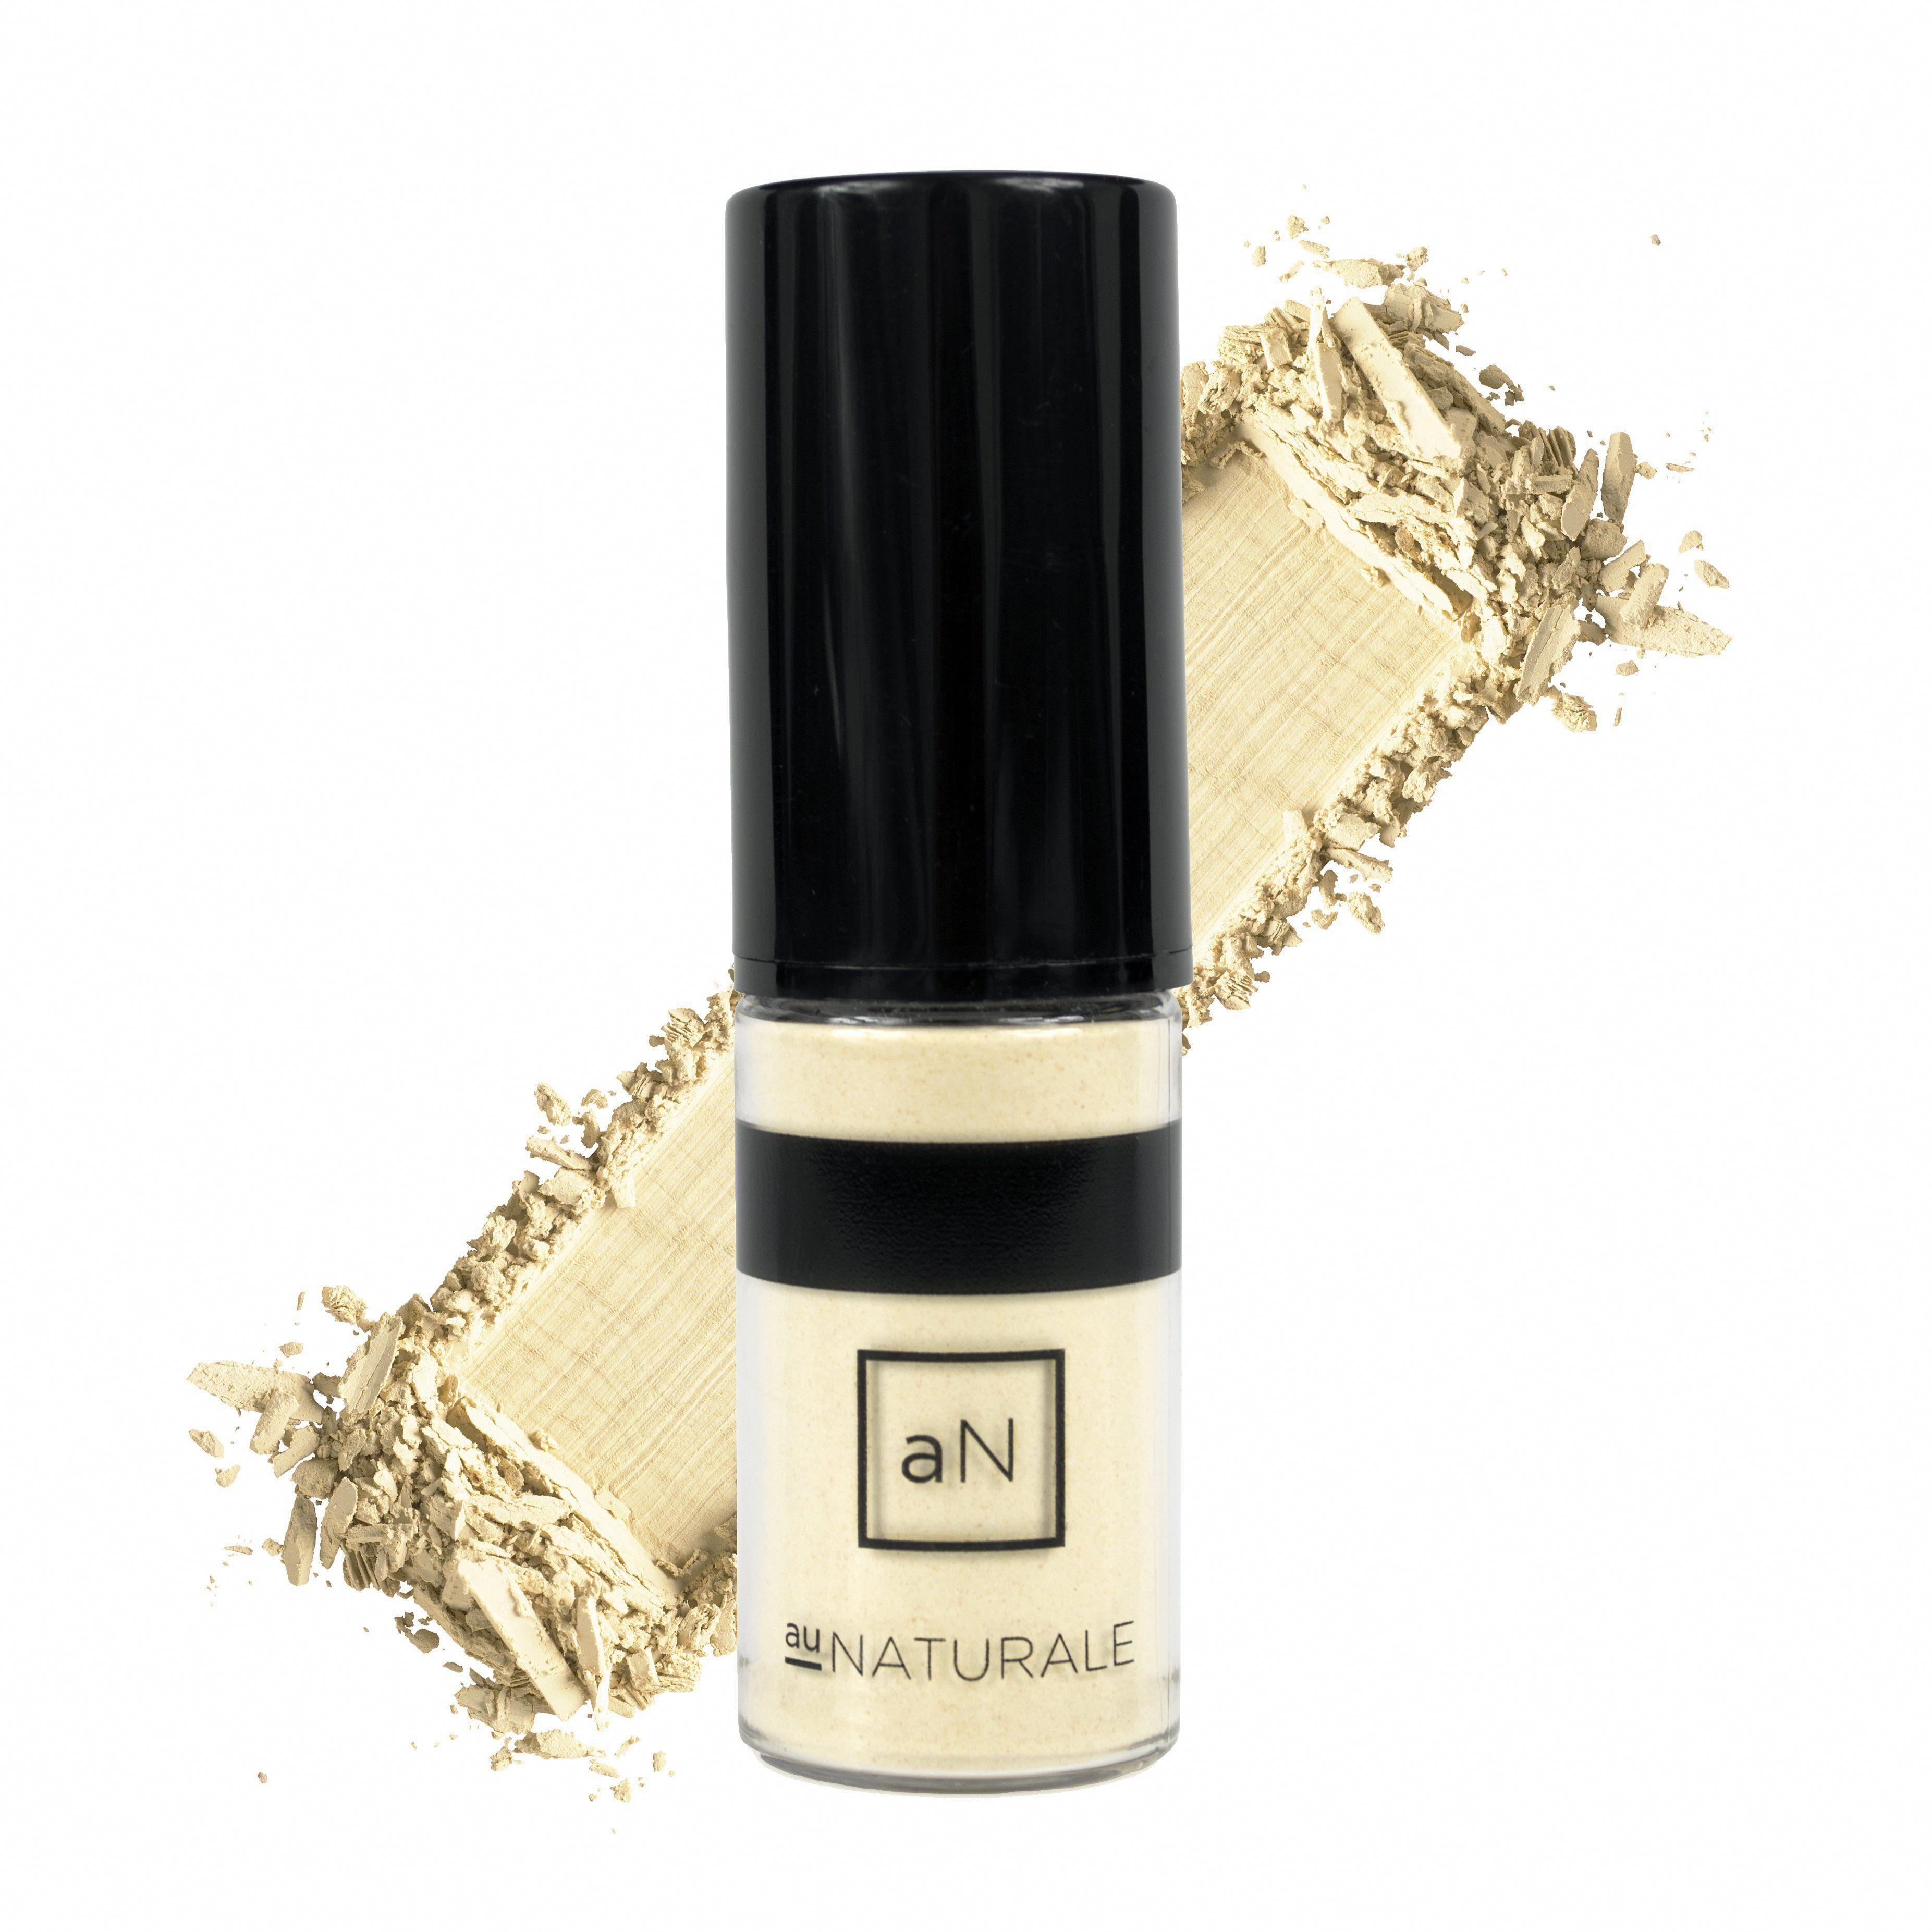 Au Naturale Pore Minimizing Finishing Powder (Spray Pump